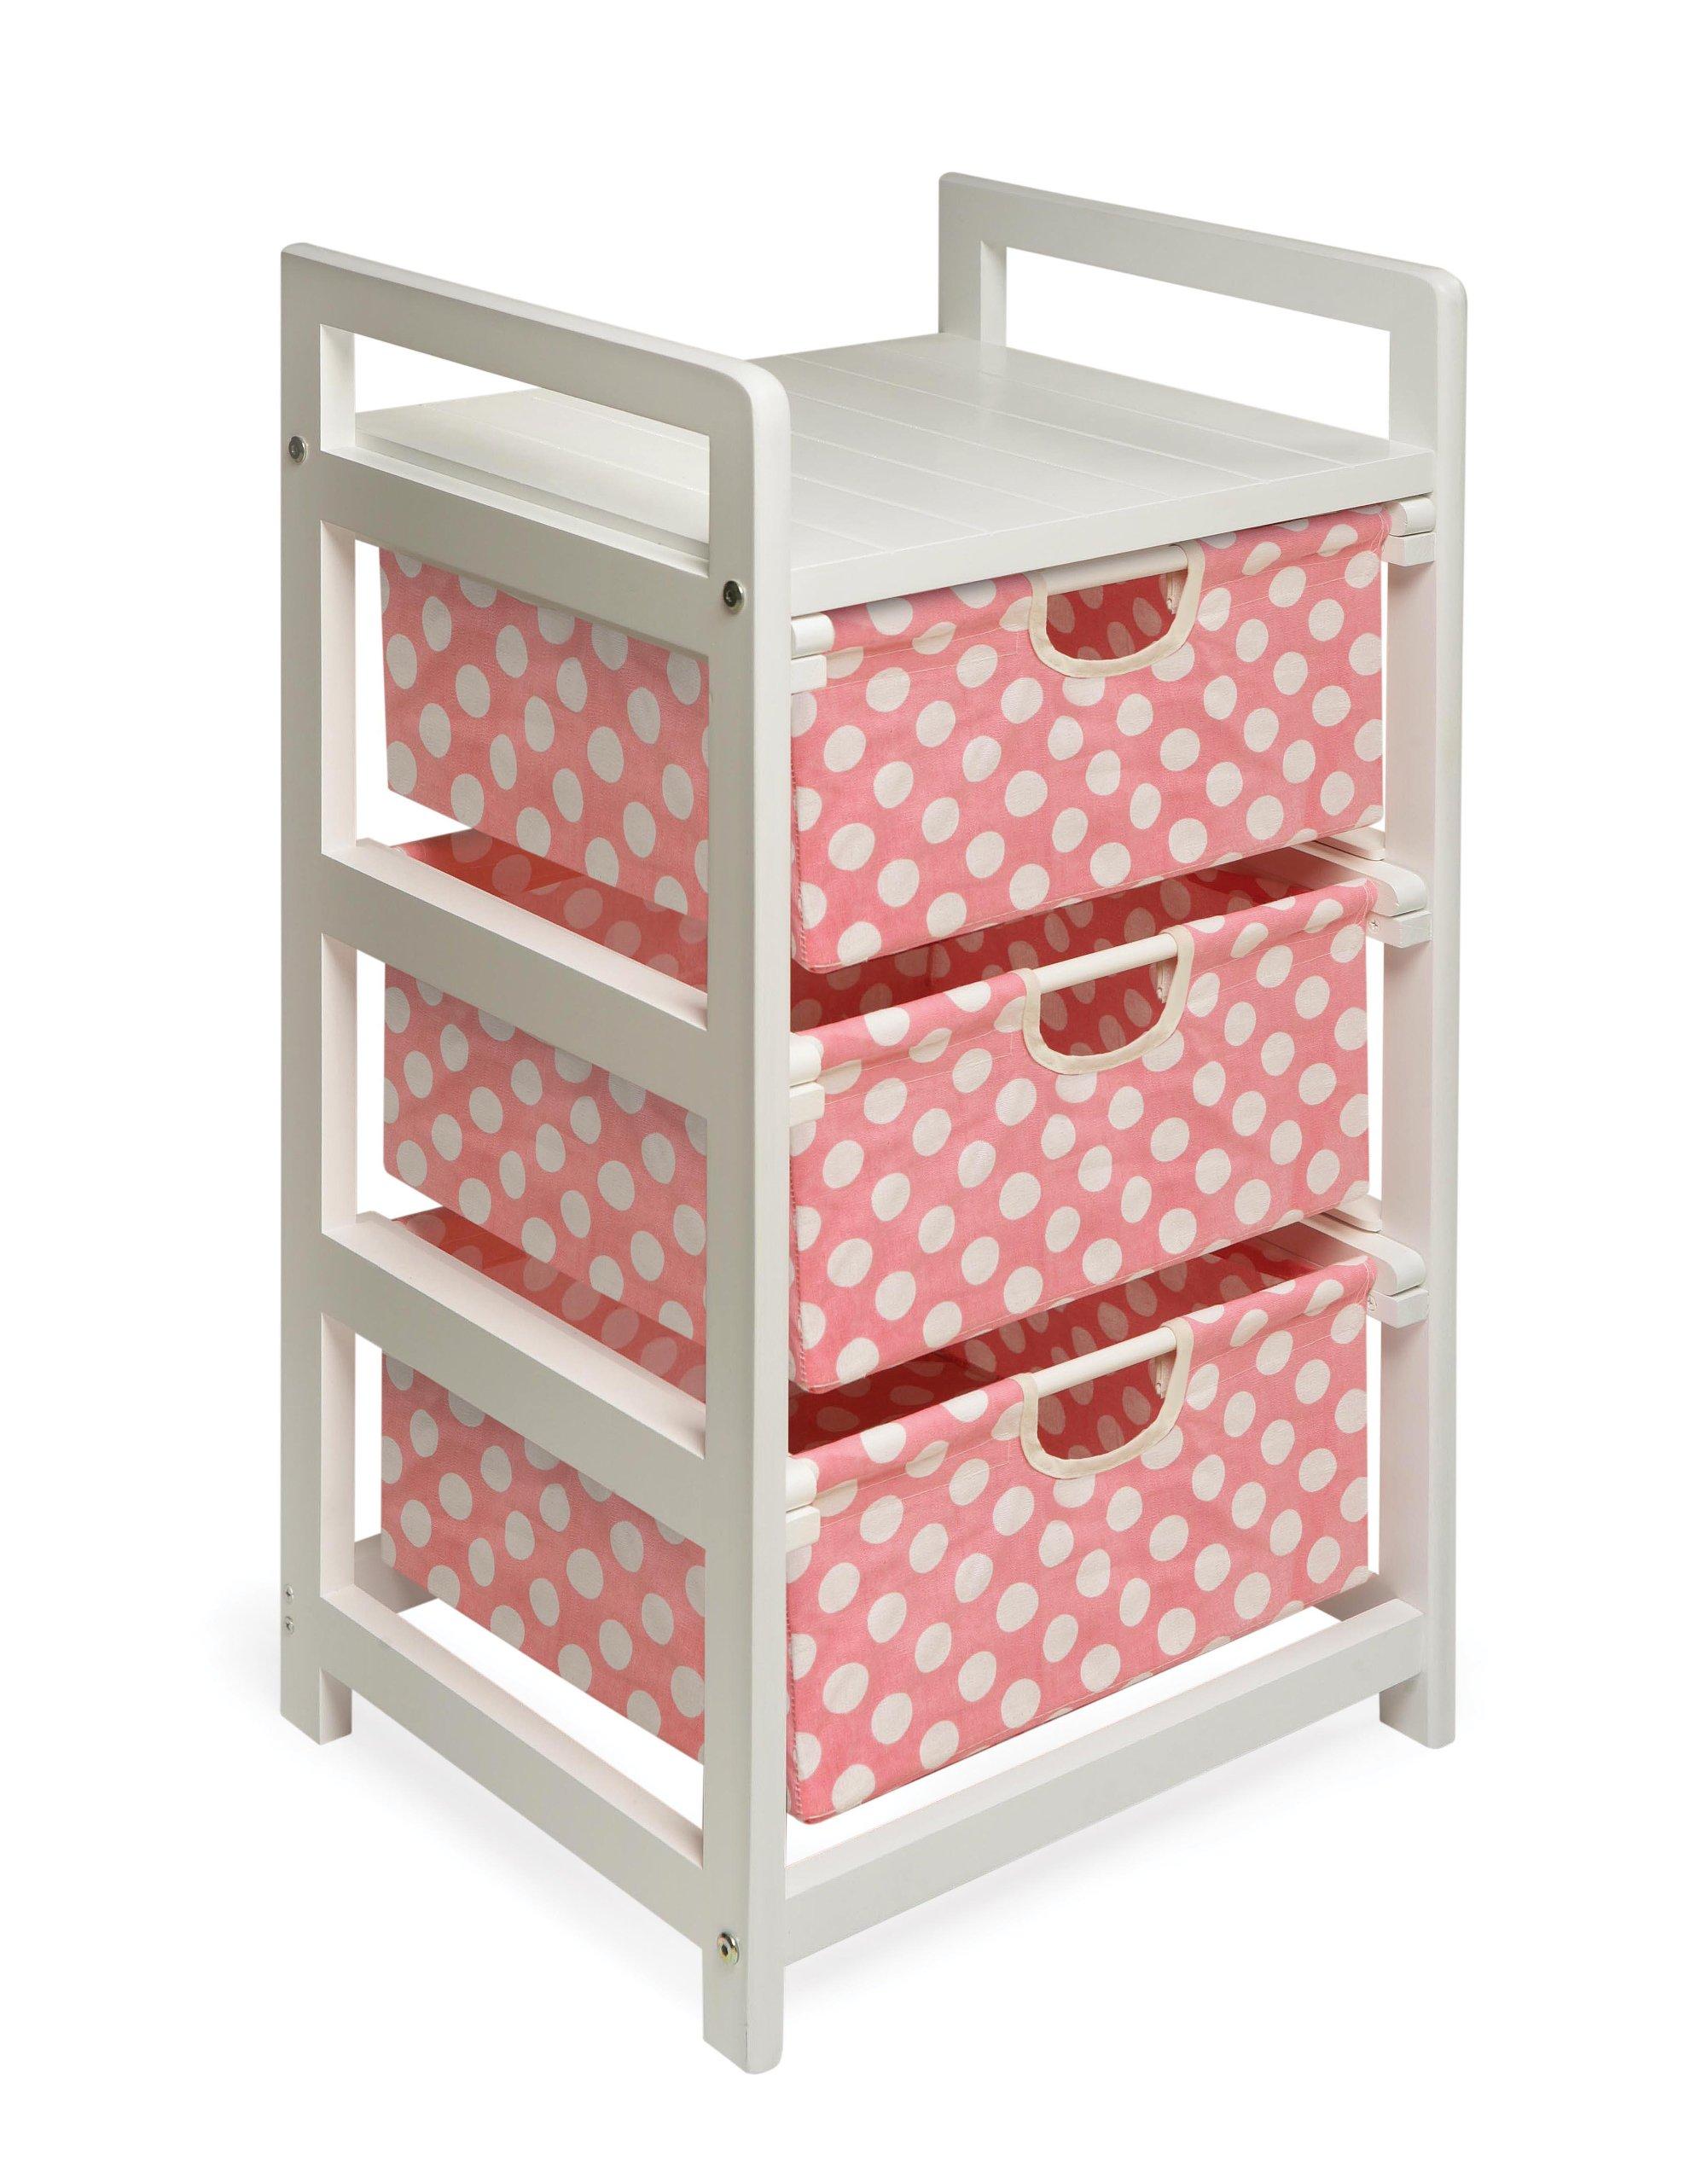 Three Drawer Hamper/Storage Unit White/Pink Polka Dot